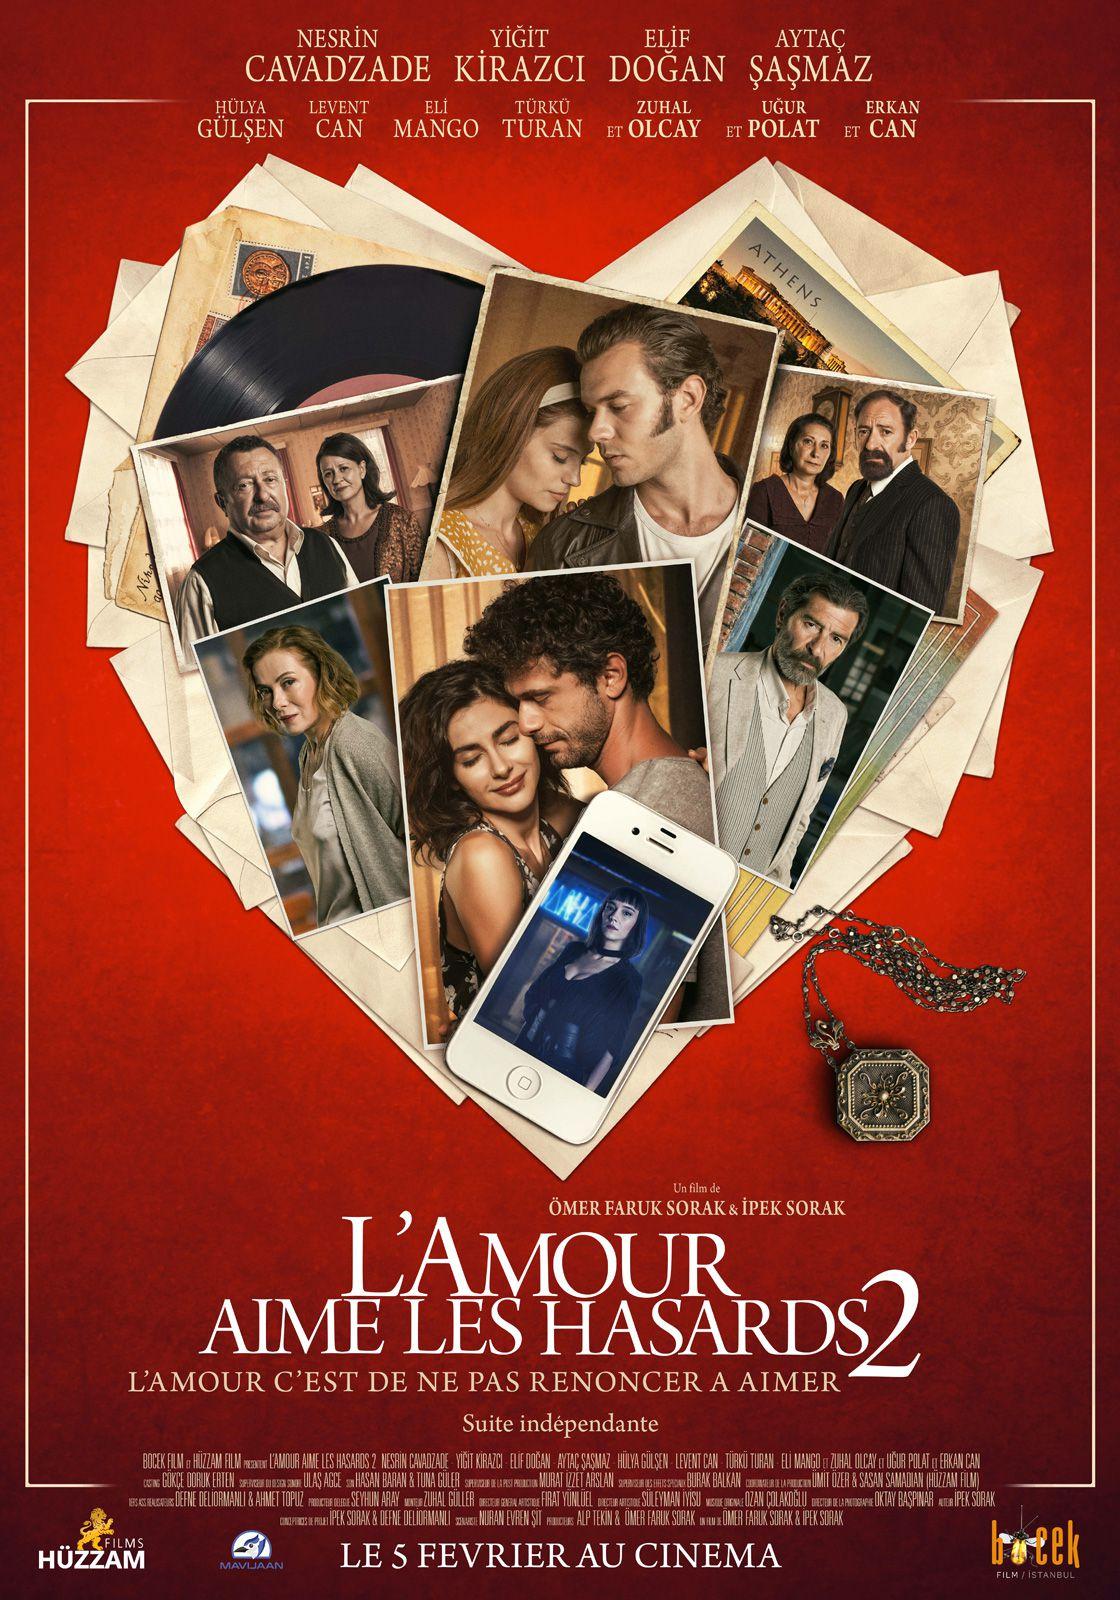 L'amour aime les hasards 2 - Film (2020)